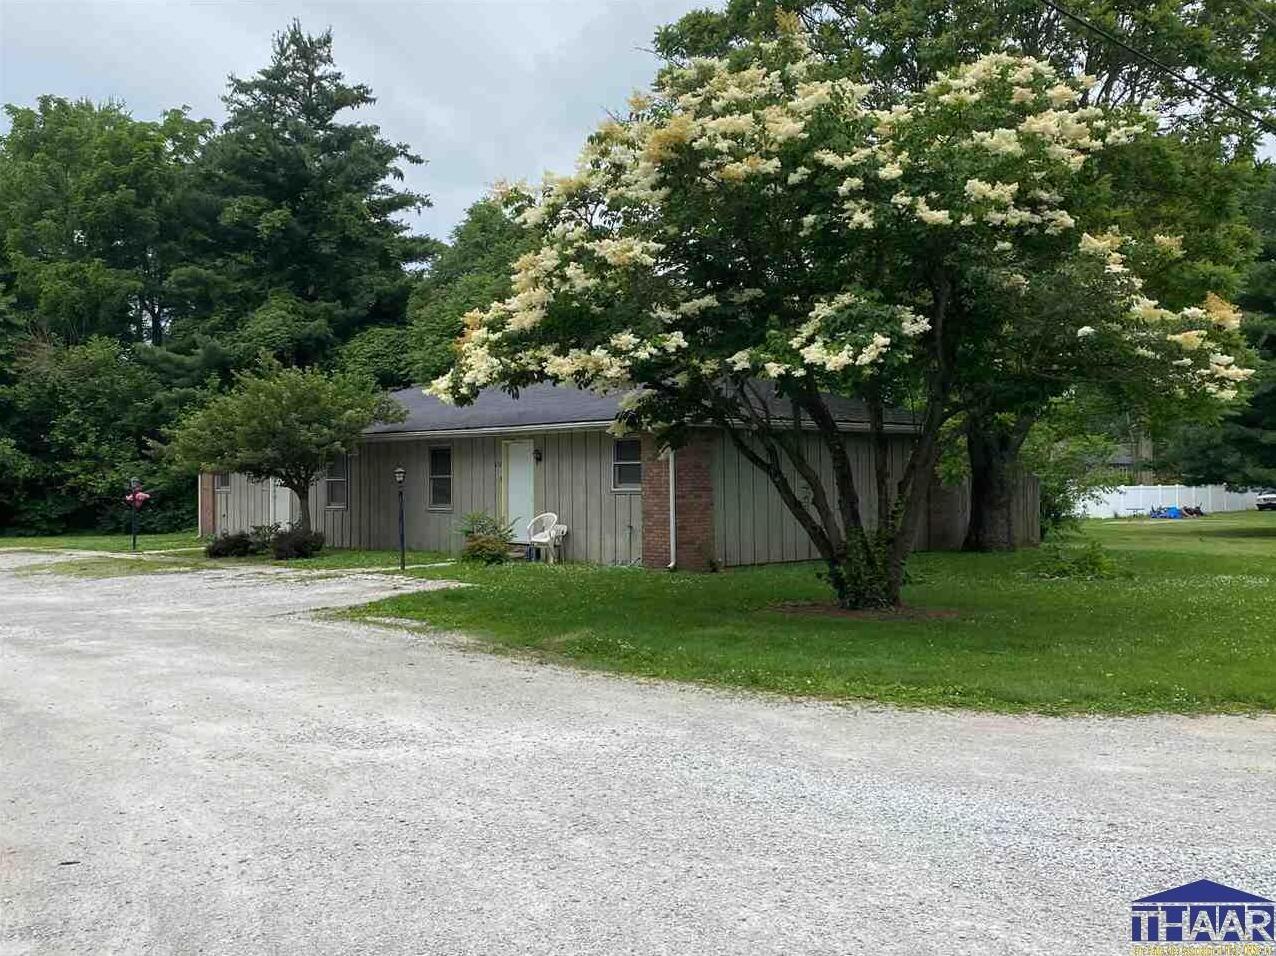 Photo of 2323 Wallace Avenue Terre Haute IN 47802